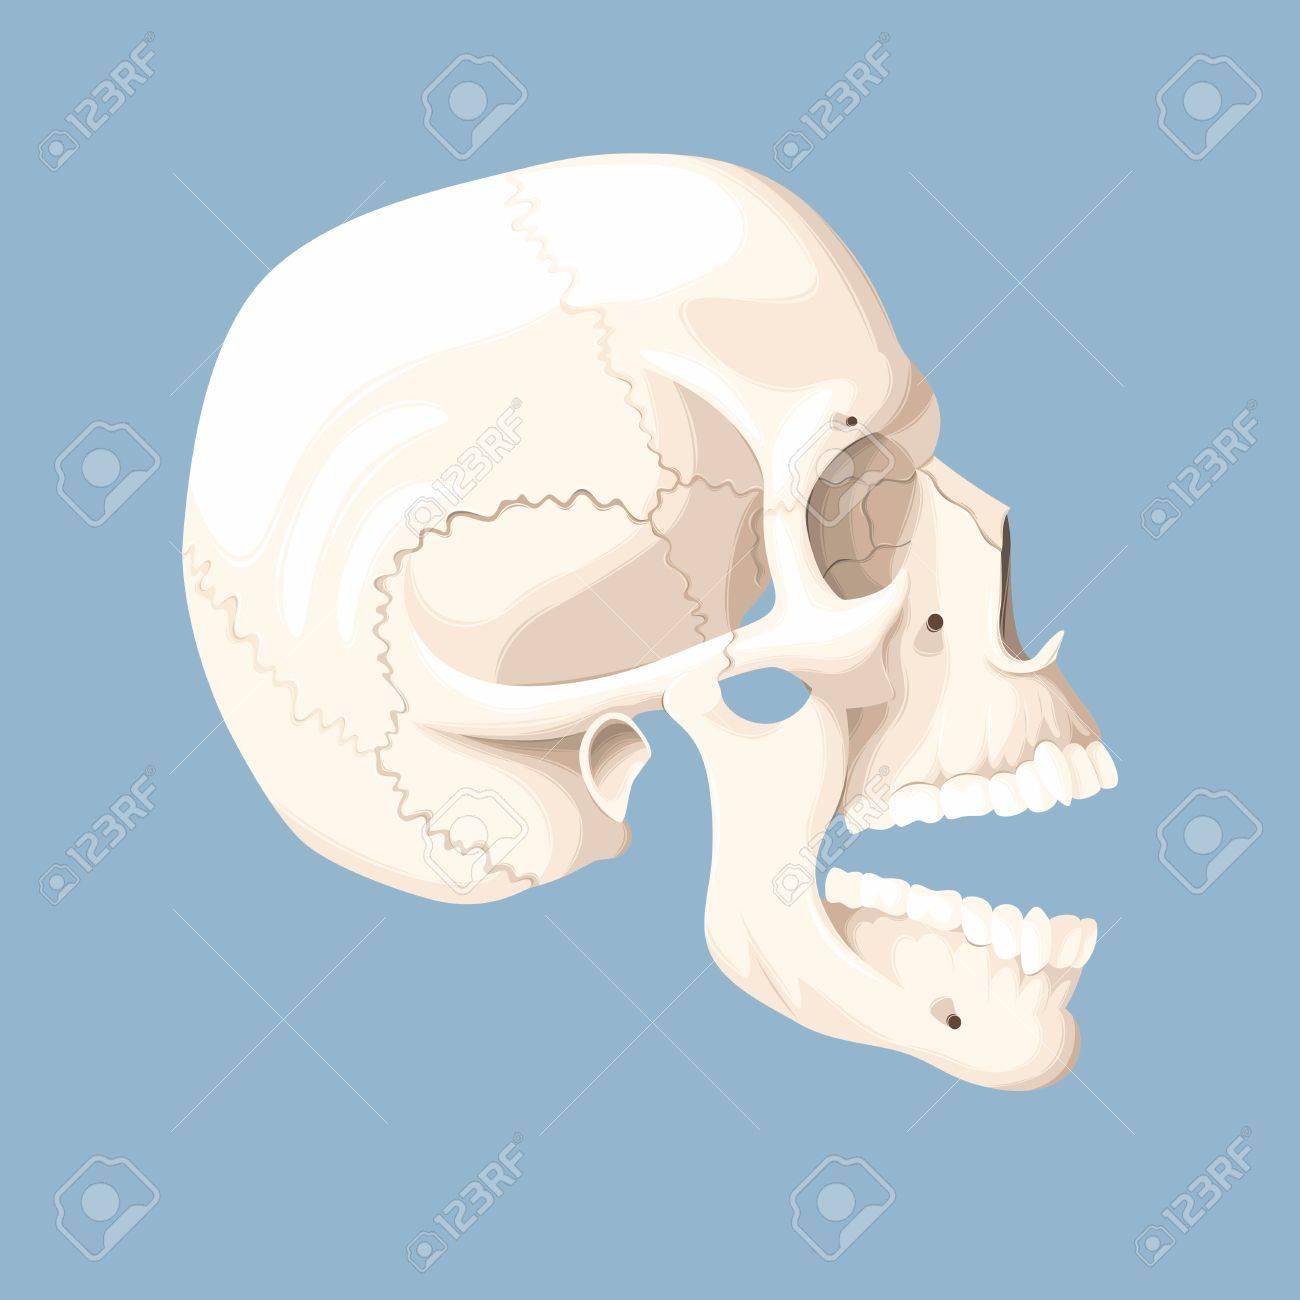 inside skull diagram allen bradley transformer wiring diagrams open block vector illustration of human with mouth royalty free